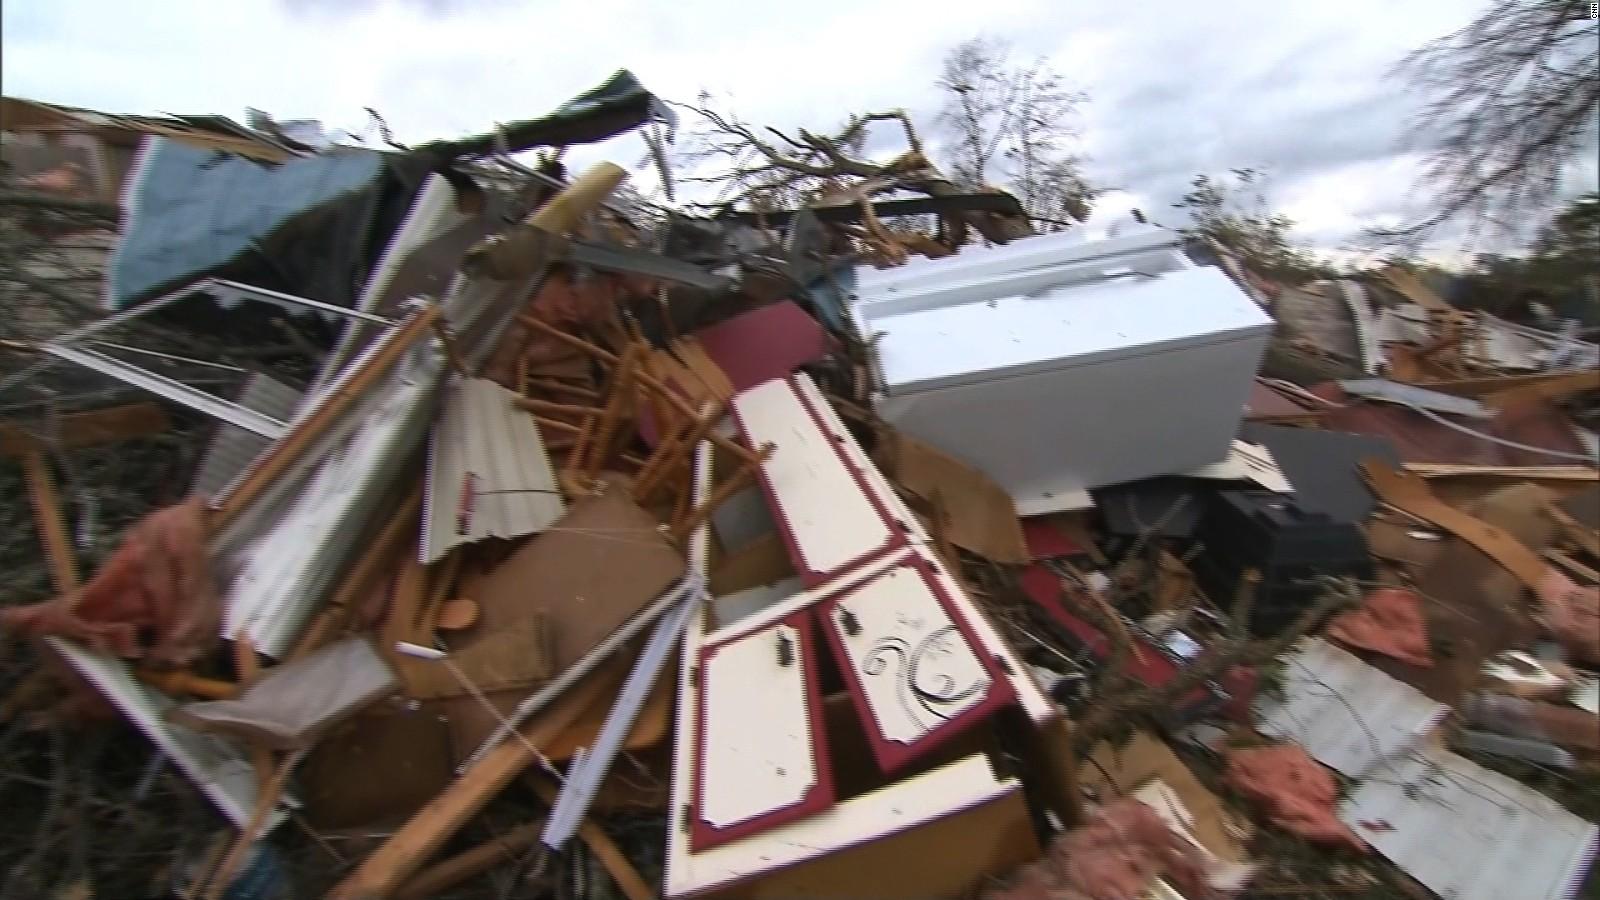 Georgia Storm Deaths 7 Killed In Trailer Park